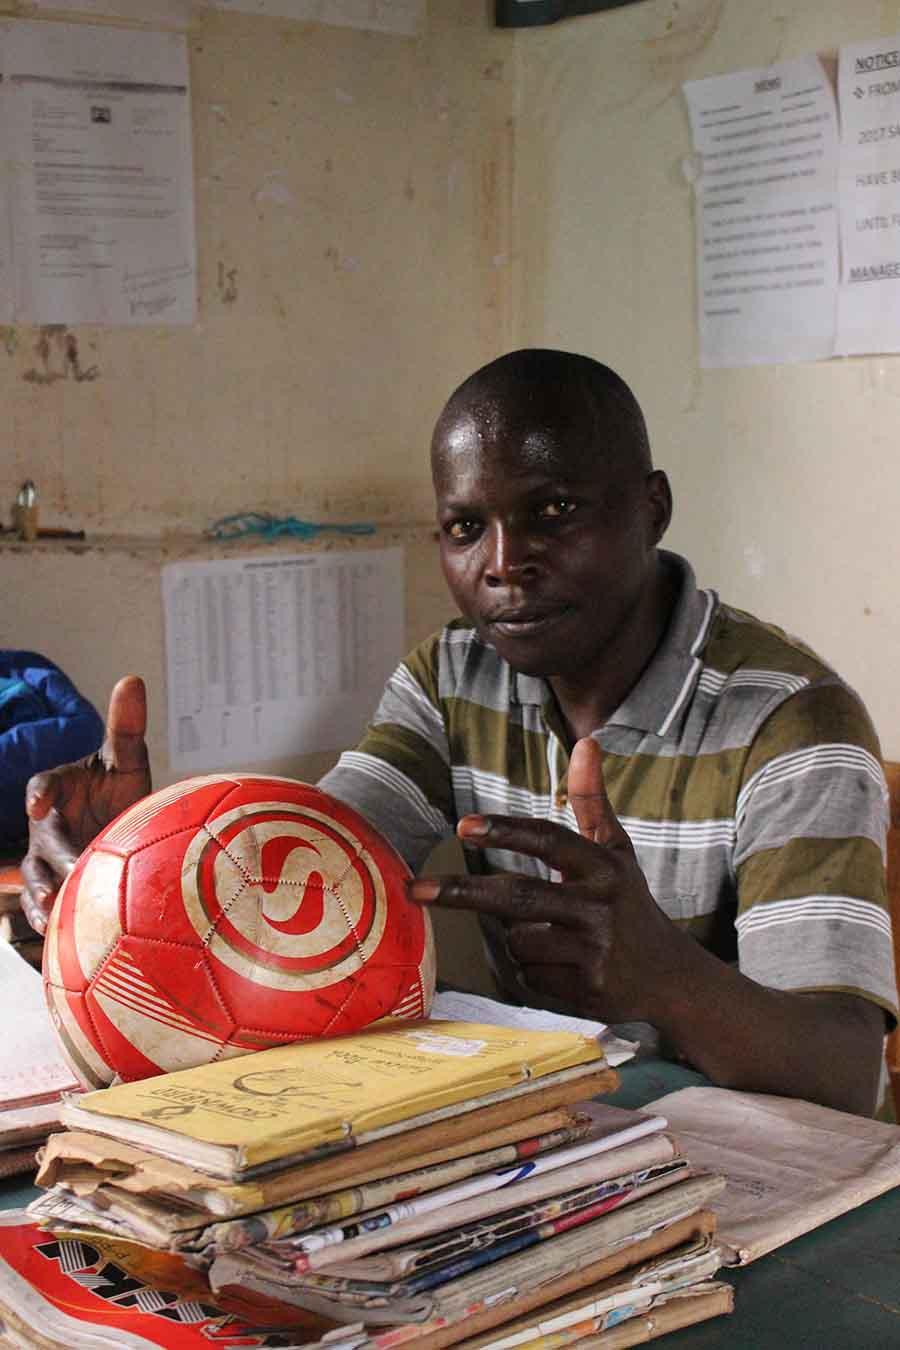 Football Captain, Kitale - Photographs by Gavin Cologne-Brookes